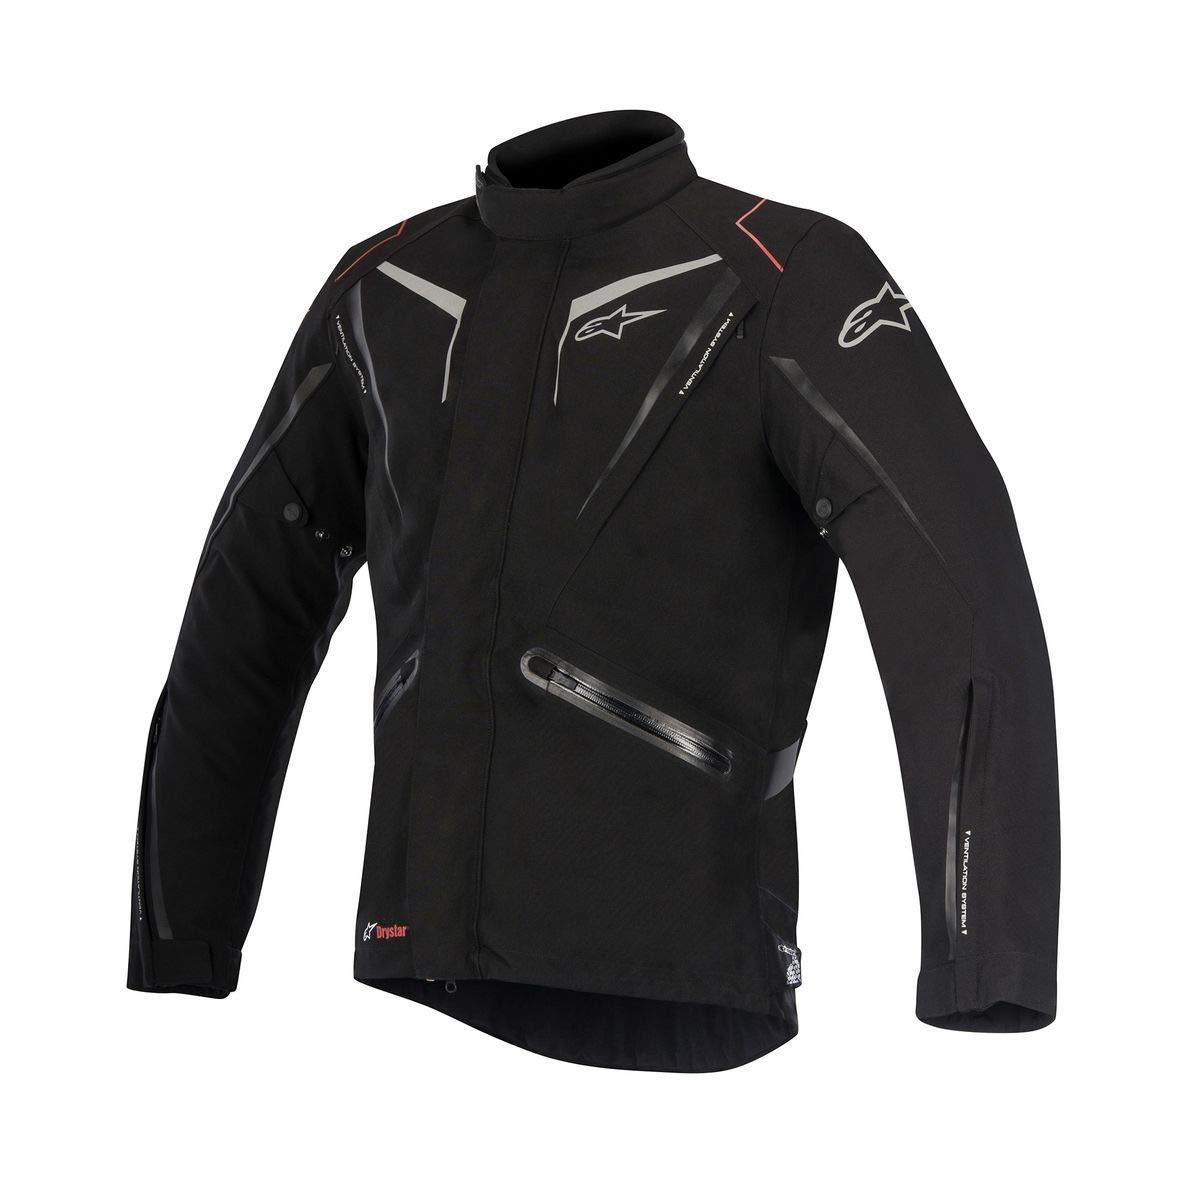 Medium Alpinestars Yokohama Drystar Jacket Black